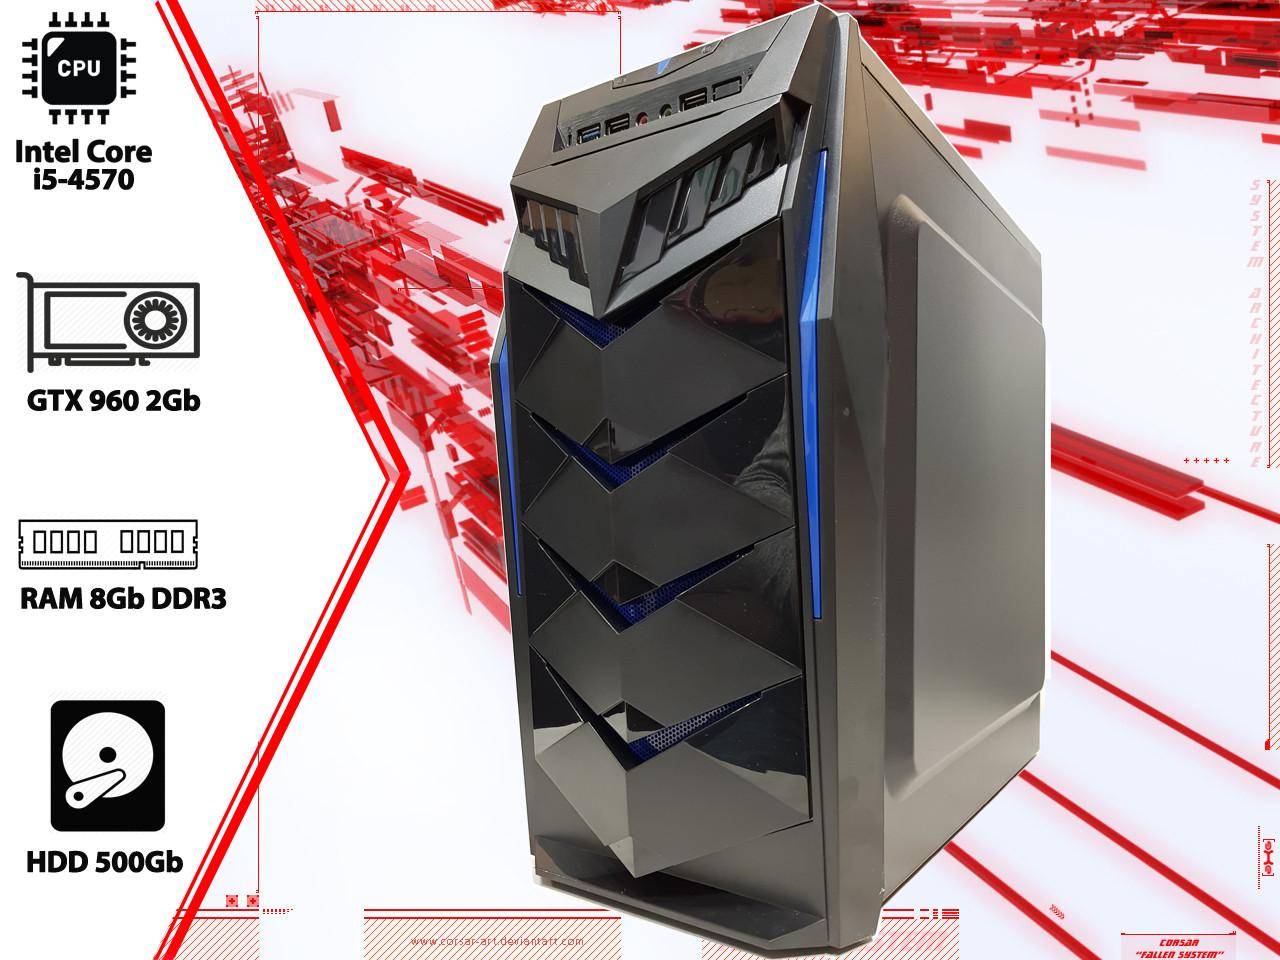 Игровой ПК Intel Core i5 4570, GTX 960, DDR3 8Gb, 500Gb